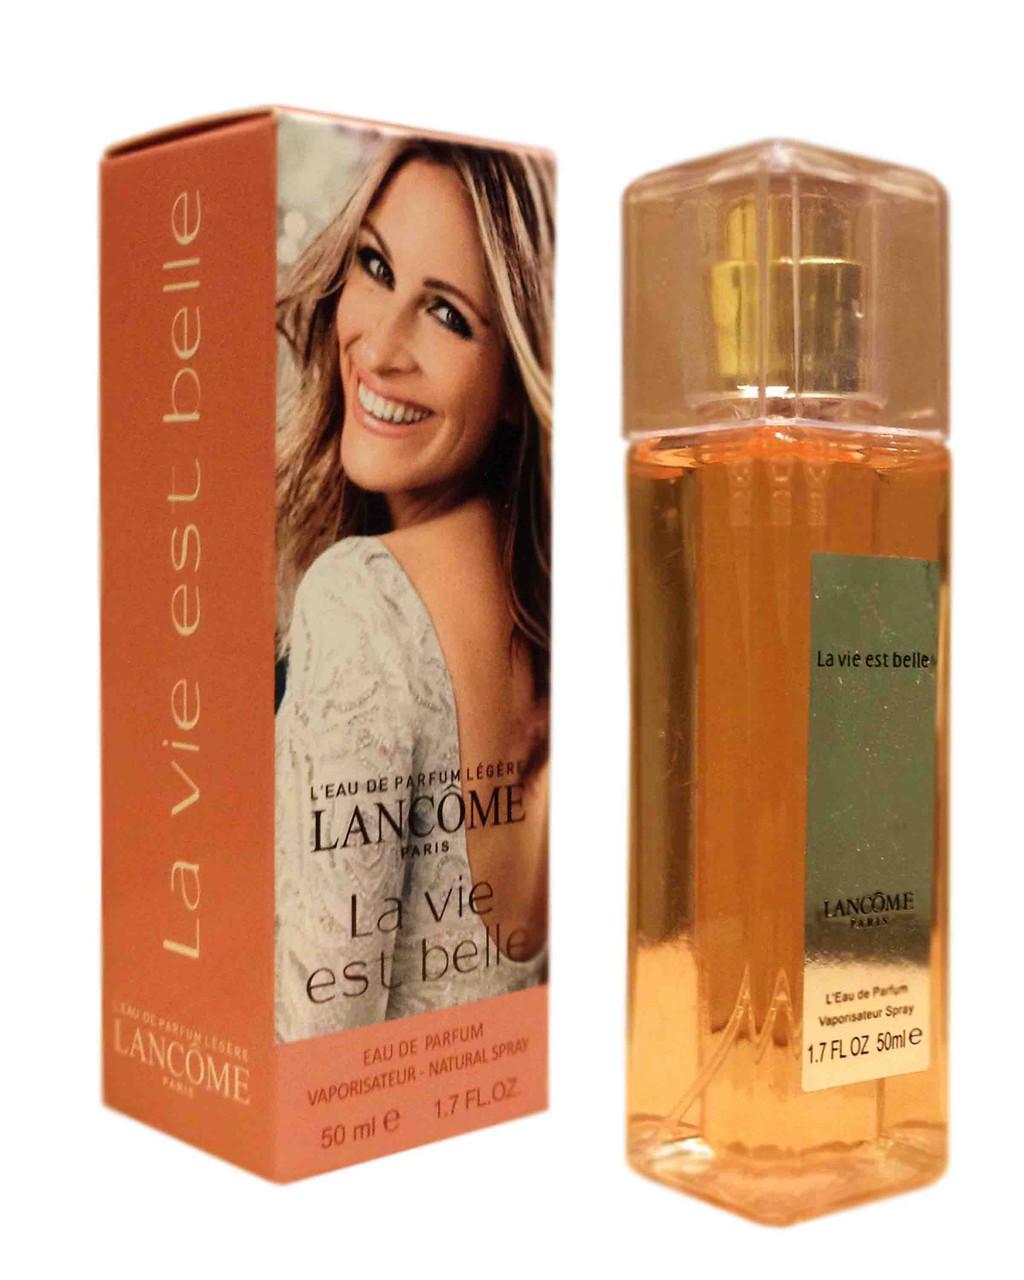 Женская парфюмированная вода Lancome La Vie Est Belle edp - Crystal Tube 50ml реплика